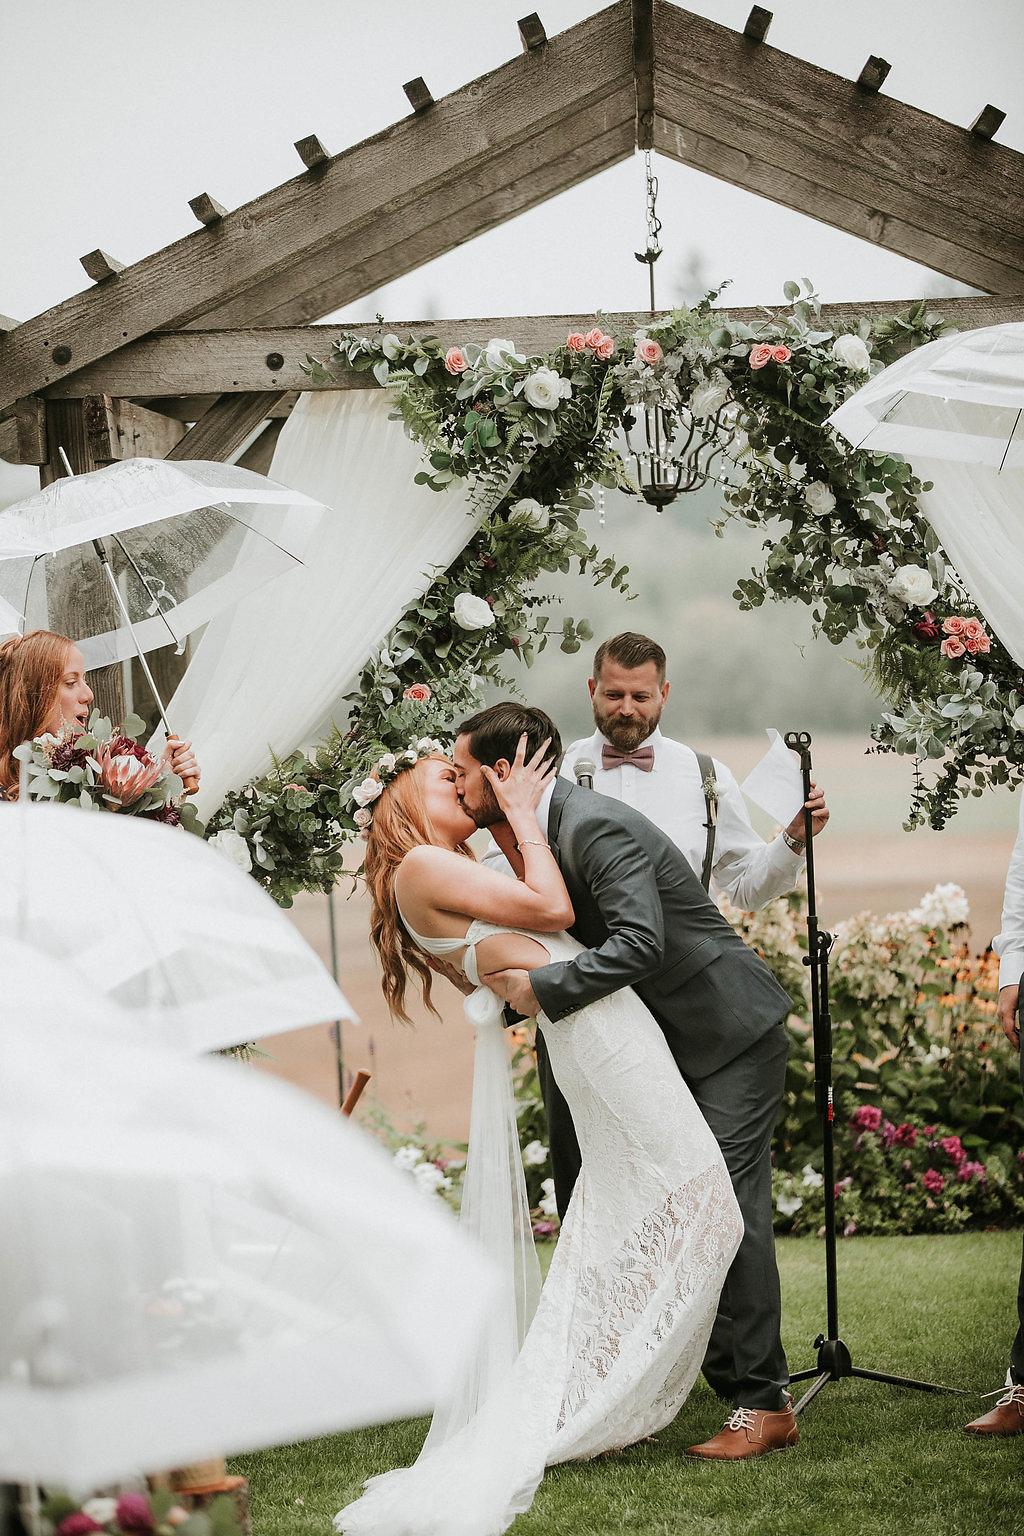 Kelley_Farm_Wedding_photos_seattle_Nicole+Ryan_by_Adina_Preston_Weddings_548.JPG